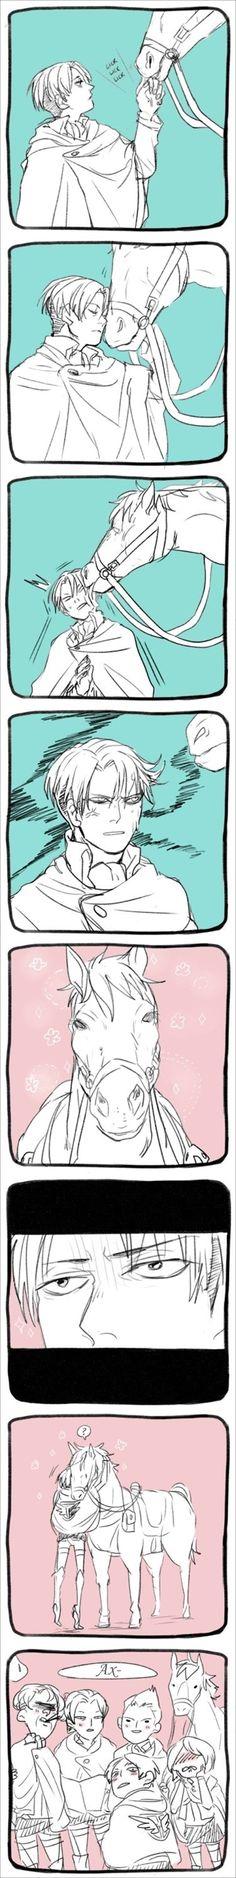 Shingeki no Kyojin - Levi - Love LOL I LIKE HOW LEVI POINTS HIS TOES TO REACH THE HORSE :3